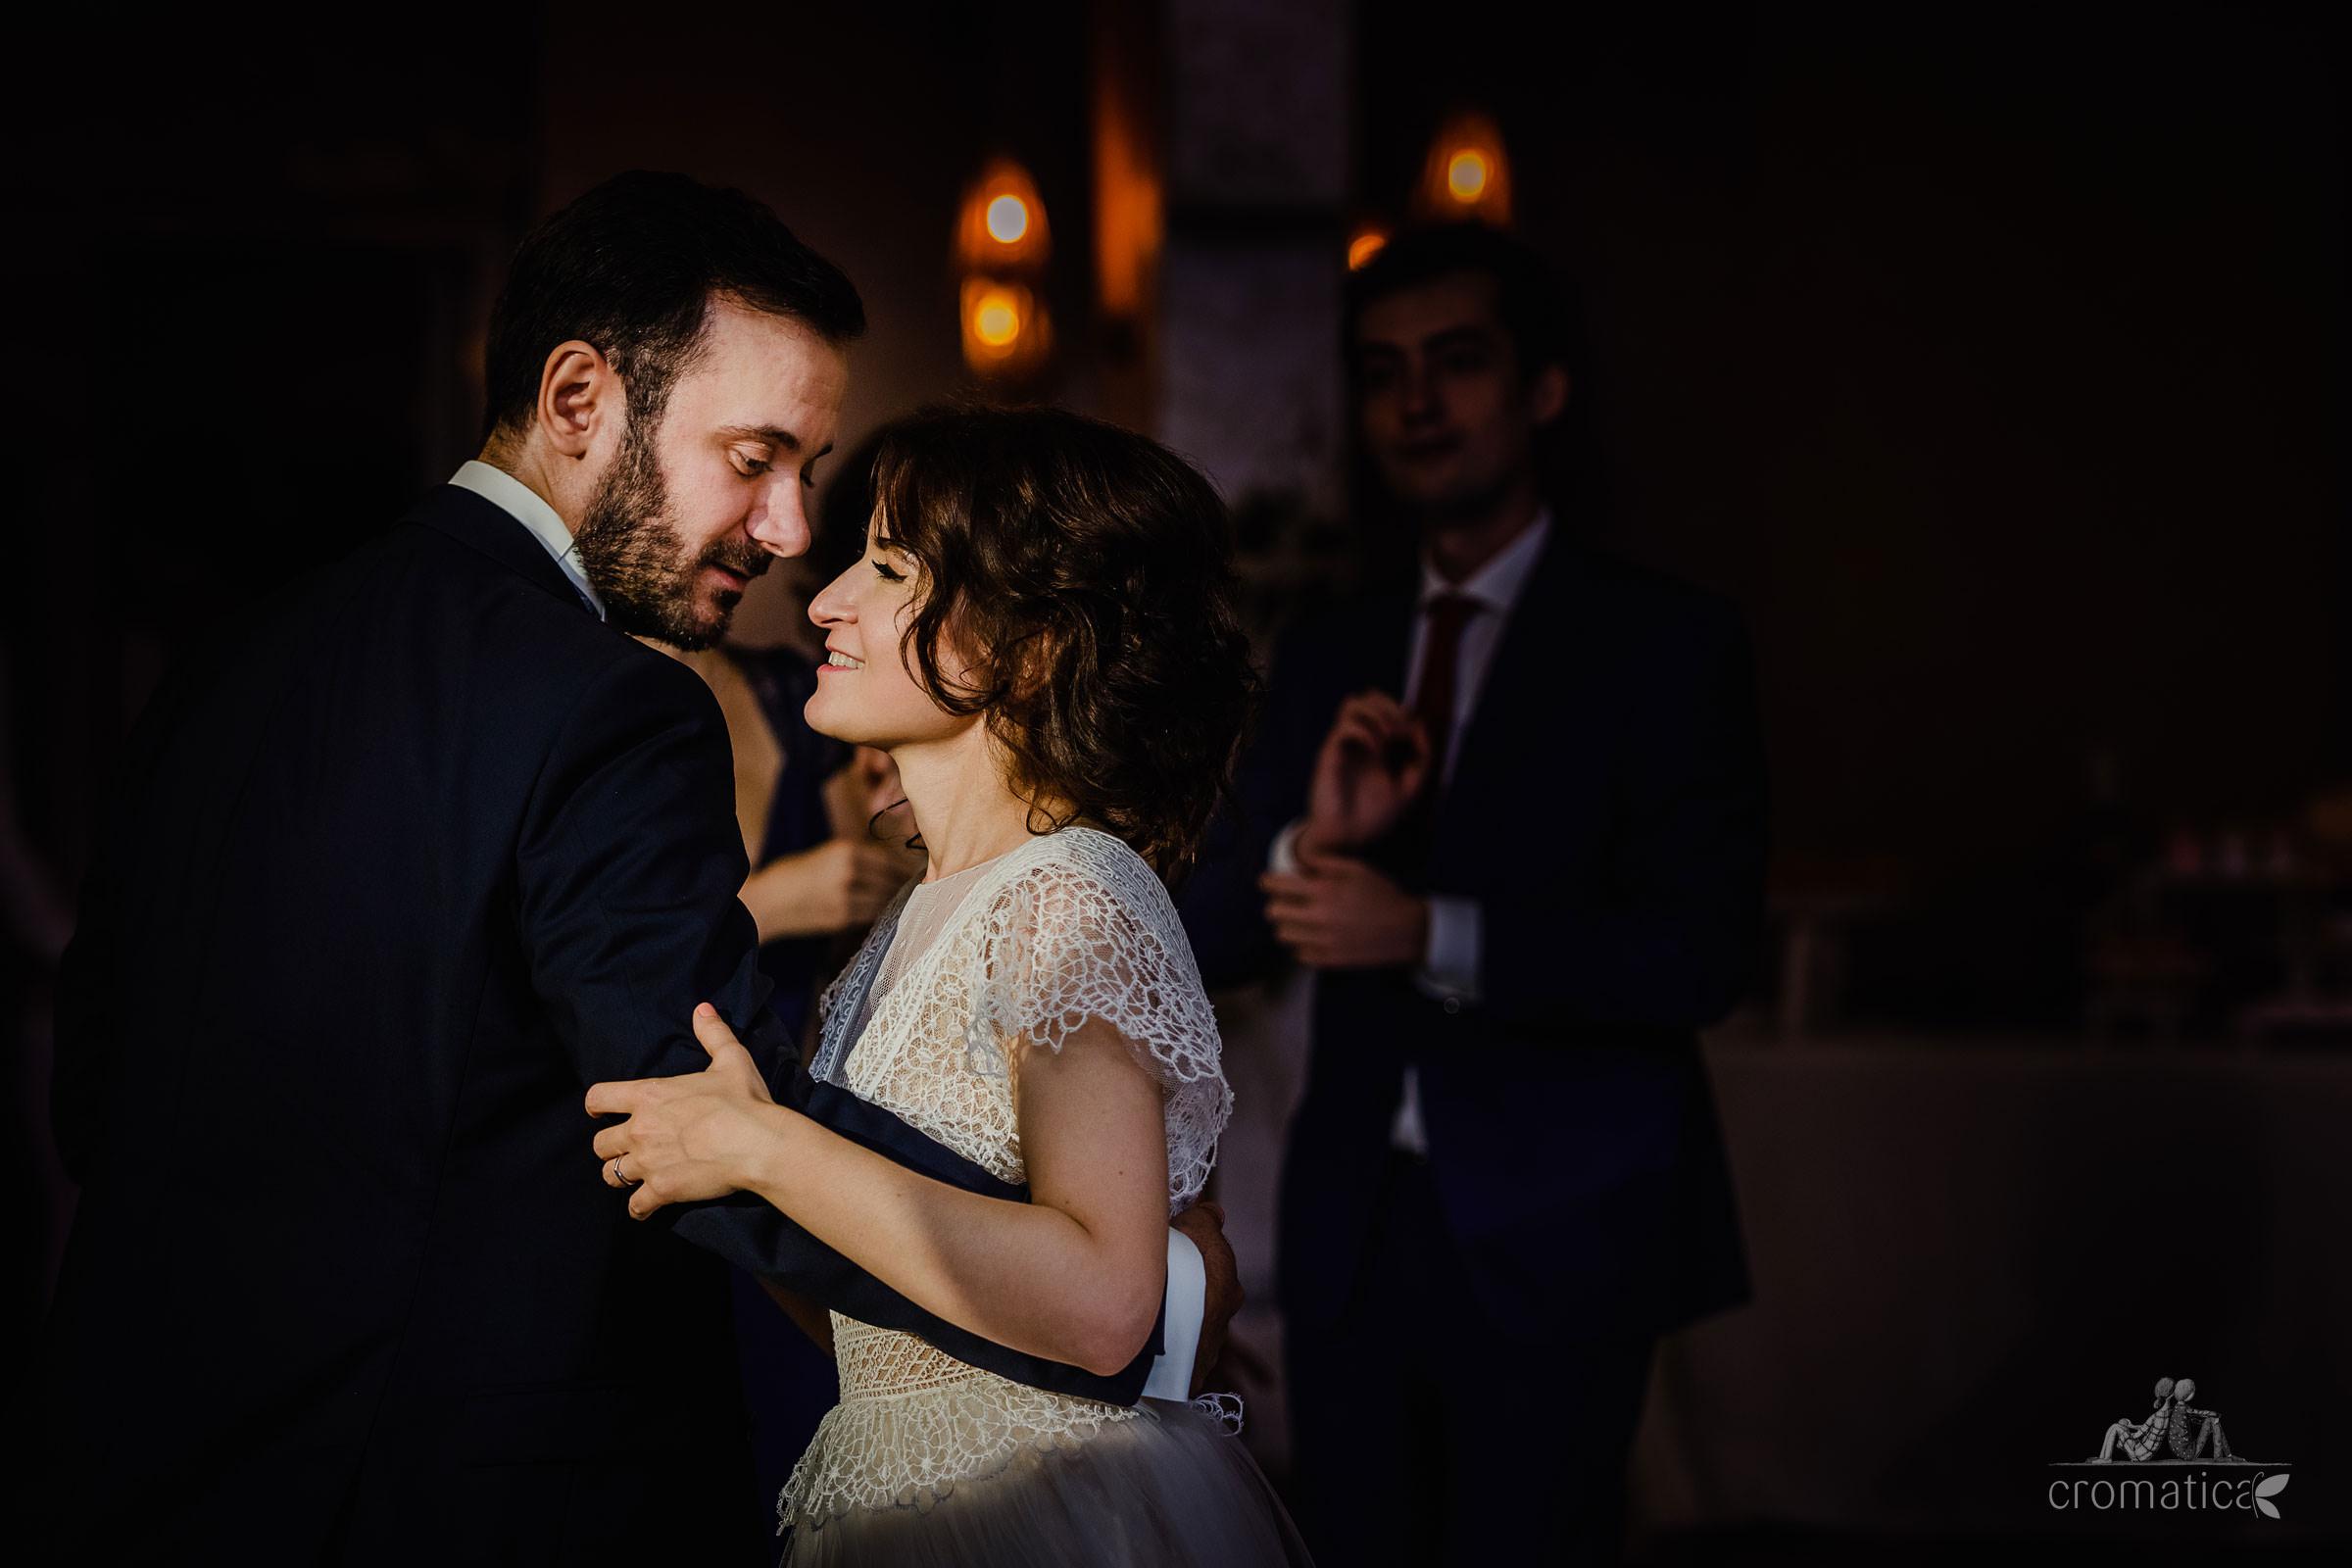 roxana mihai fotografii nunta la seratta 067